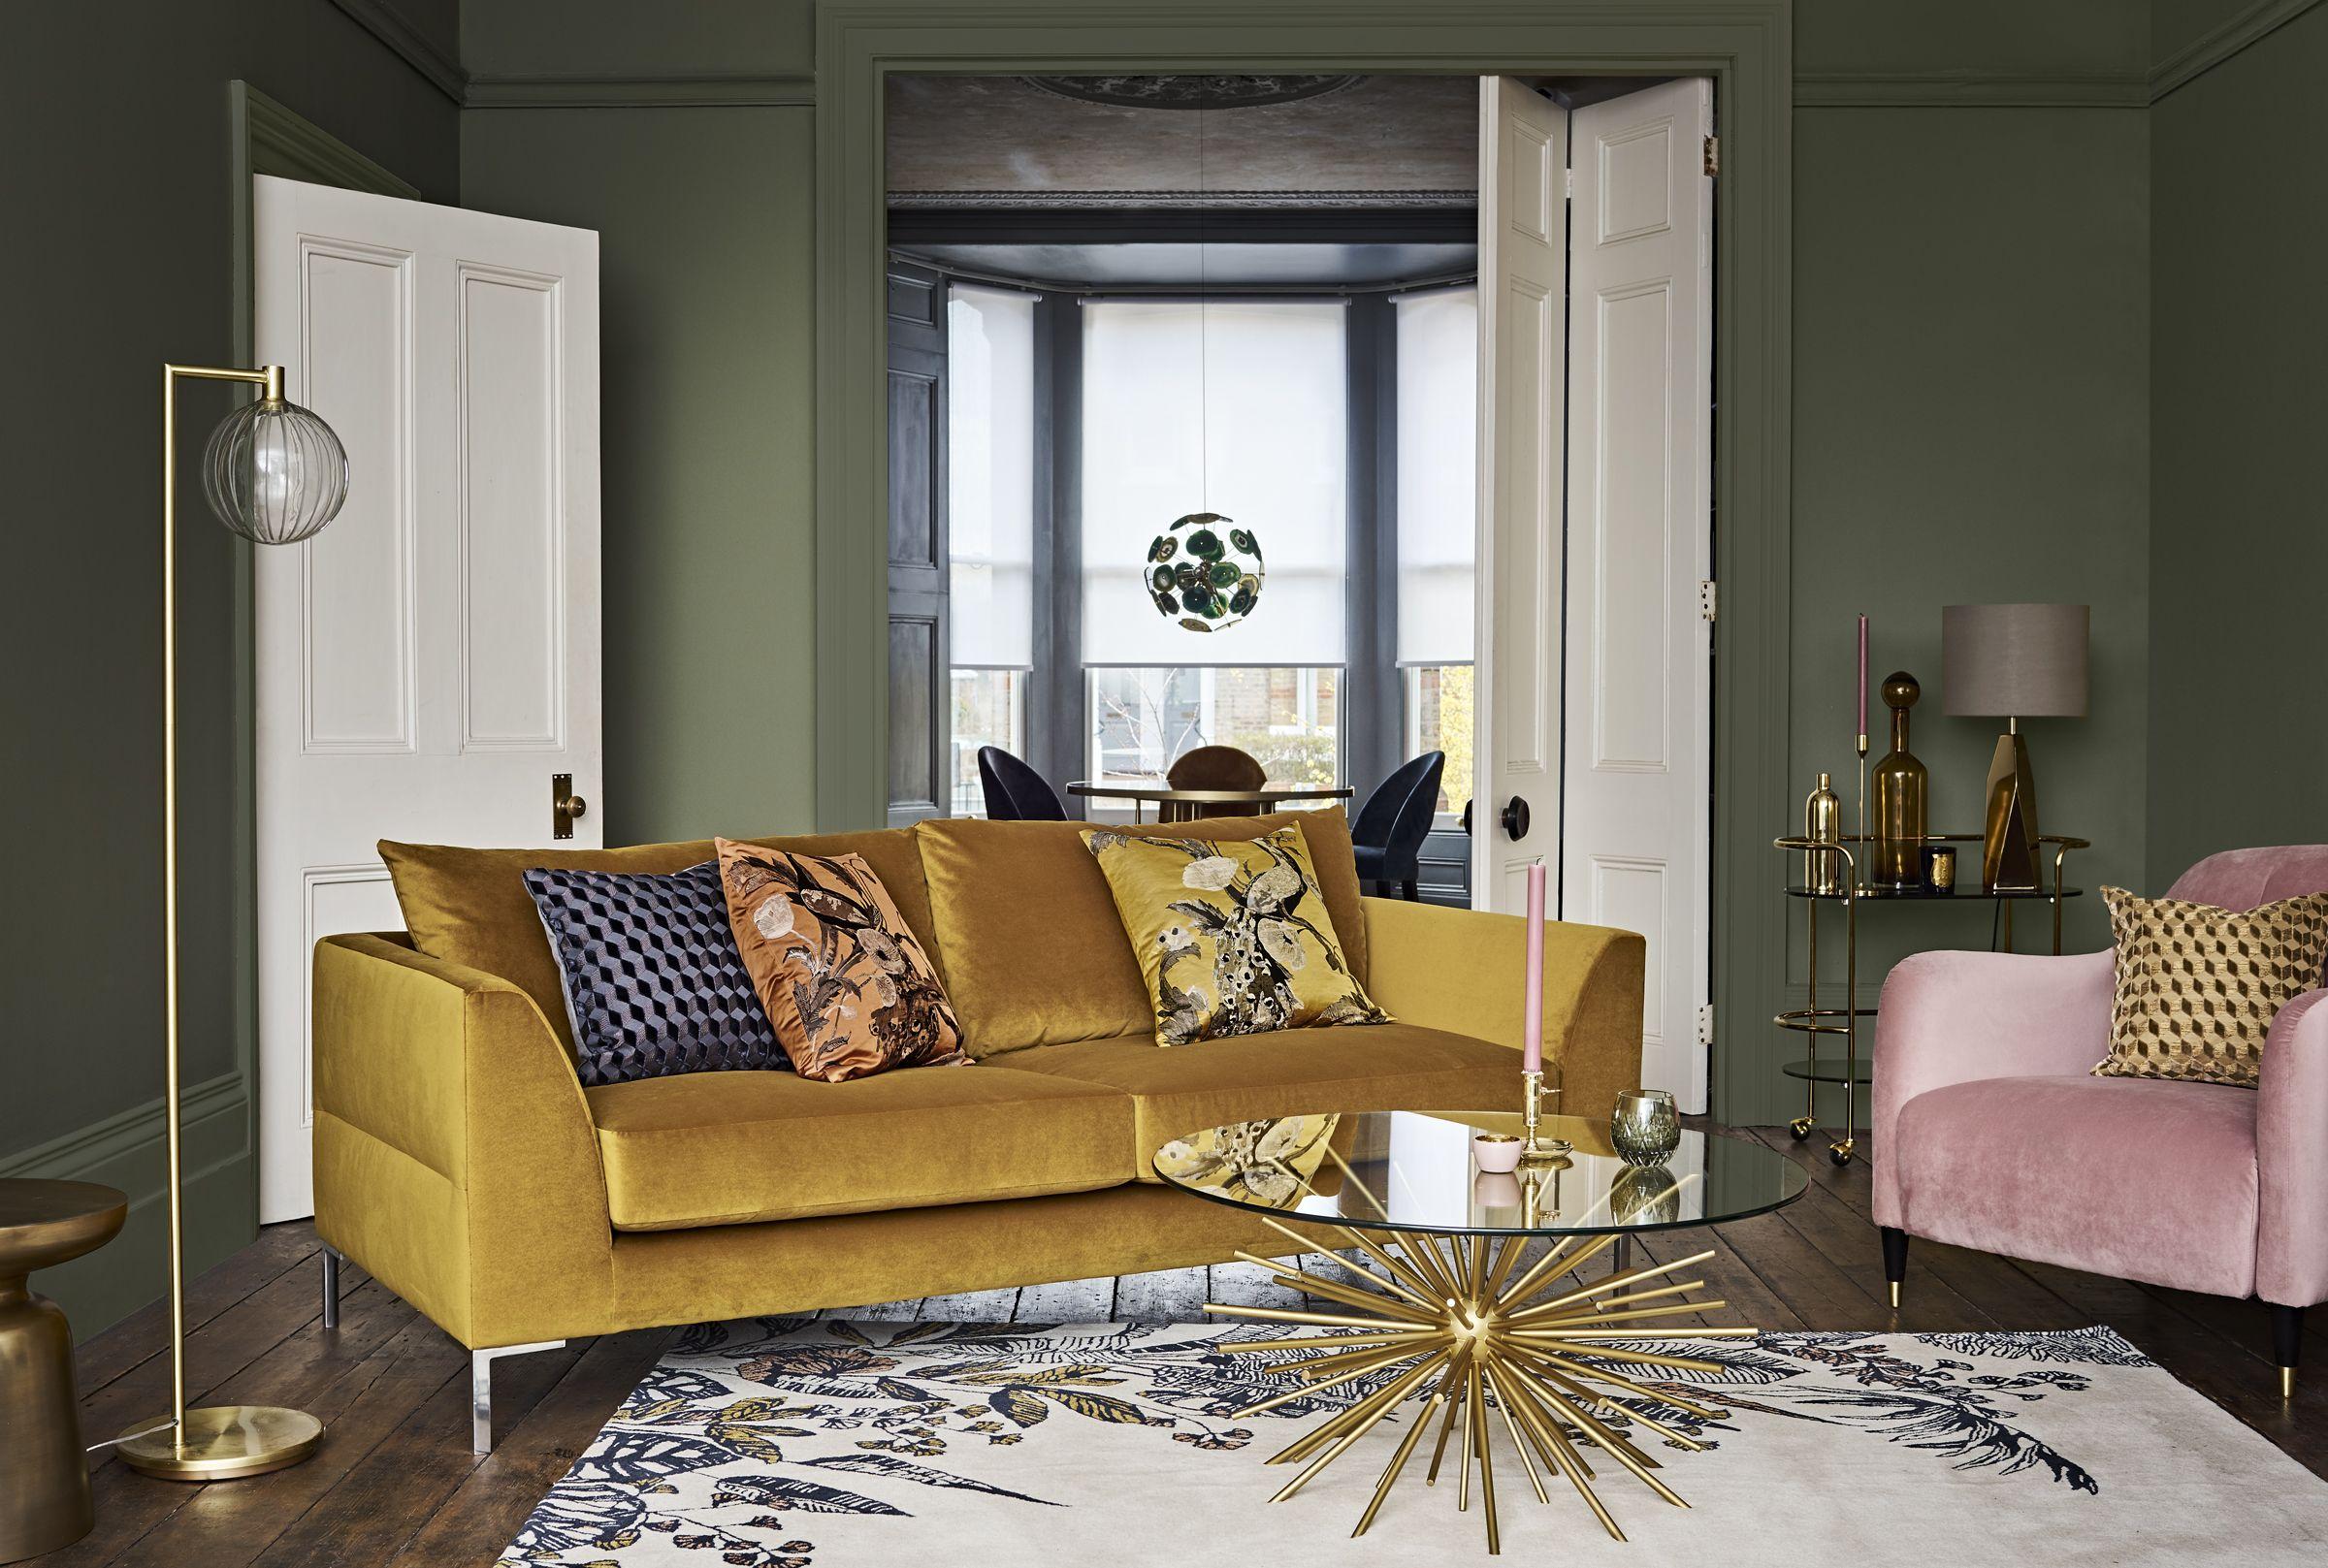 john lewis living room ideas - home interior design